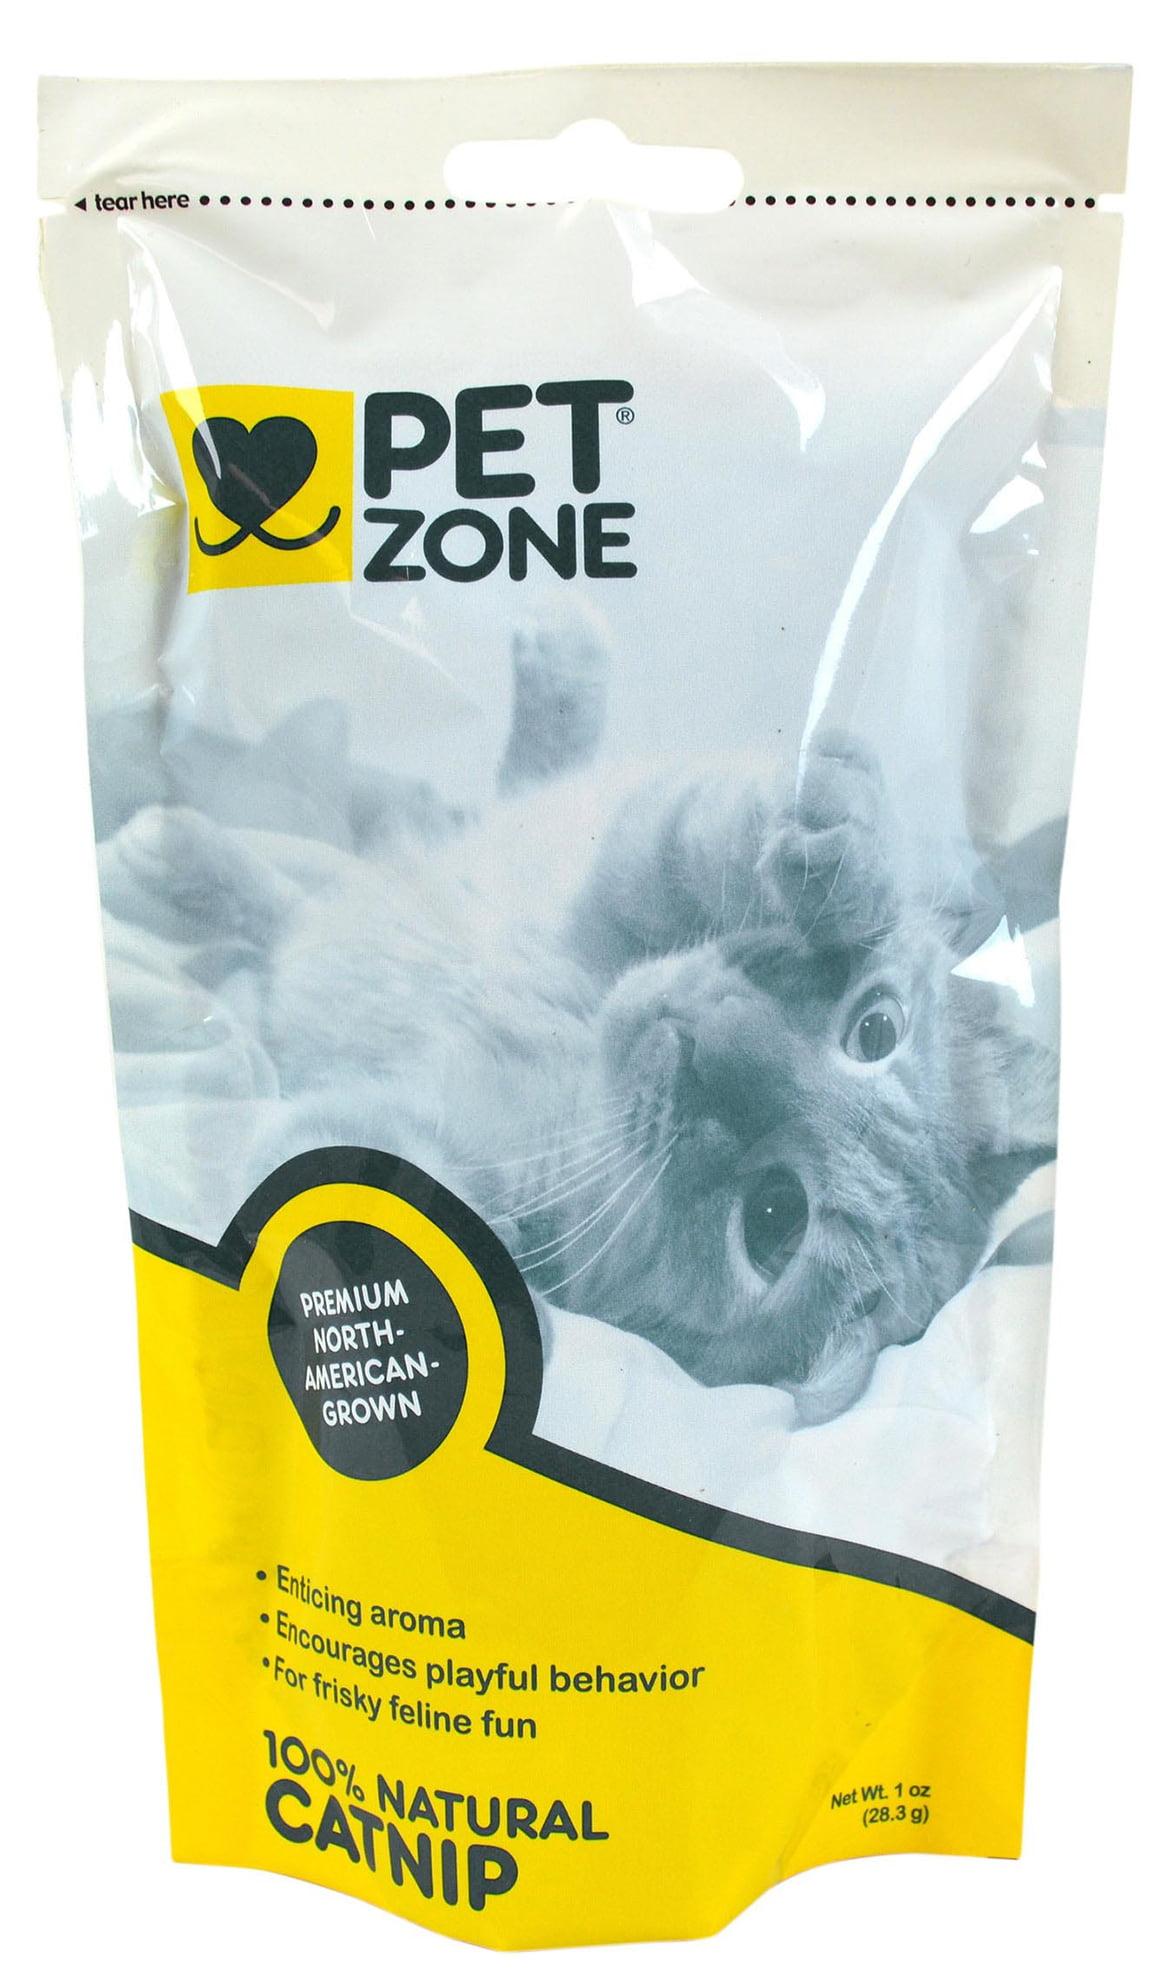 2 Packs Catnip Bag 1 Oz by